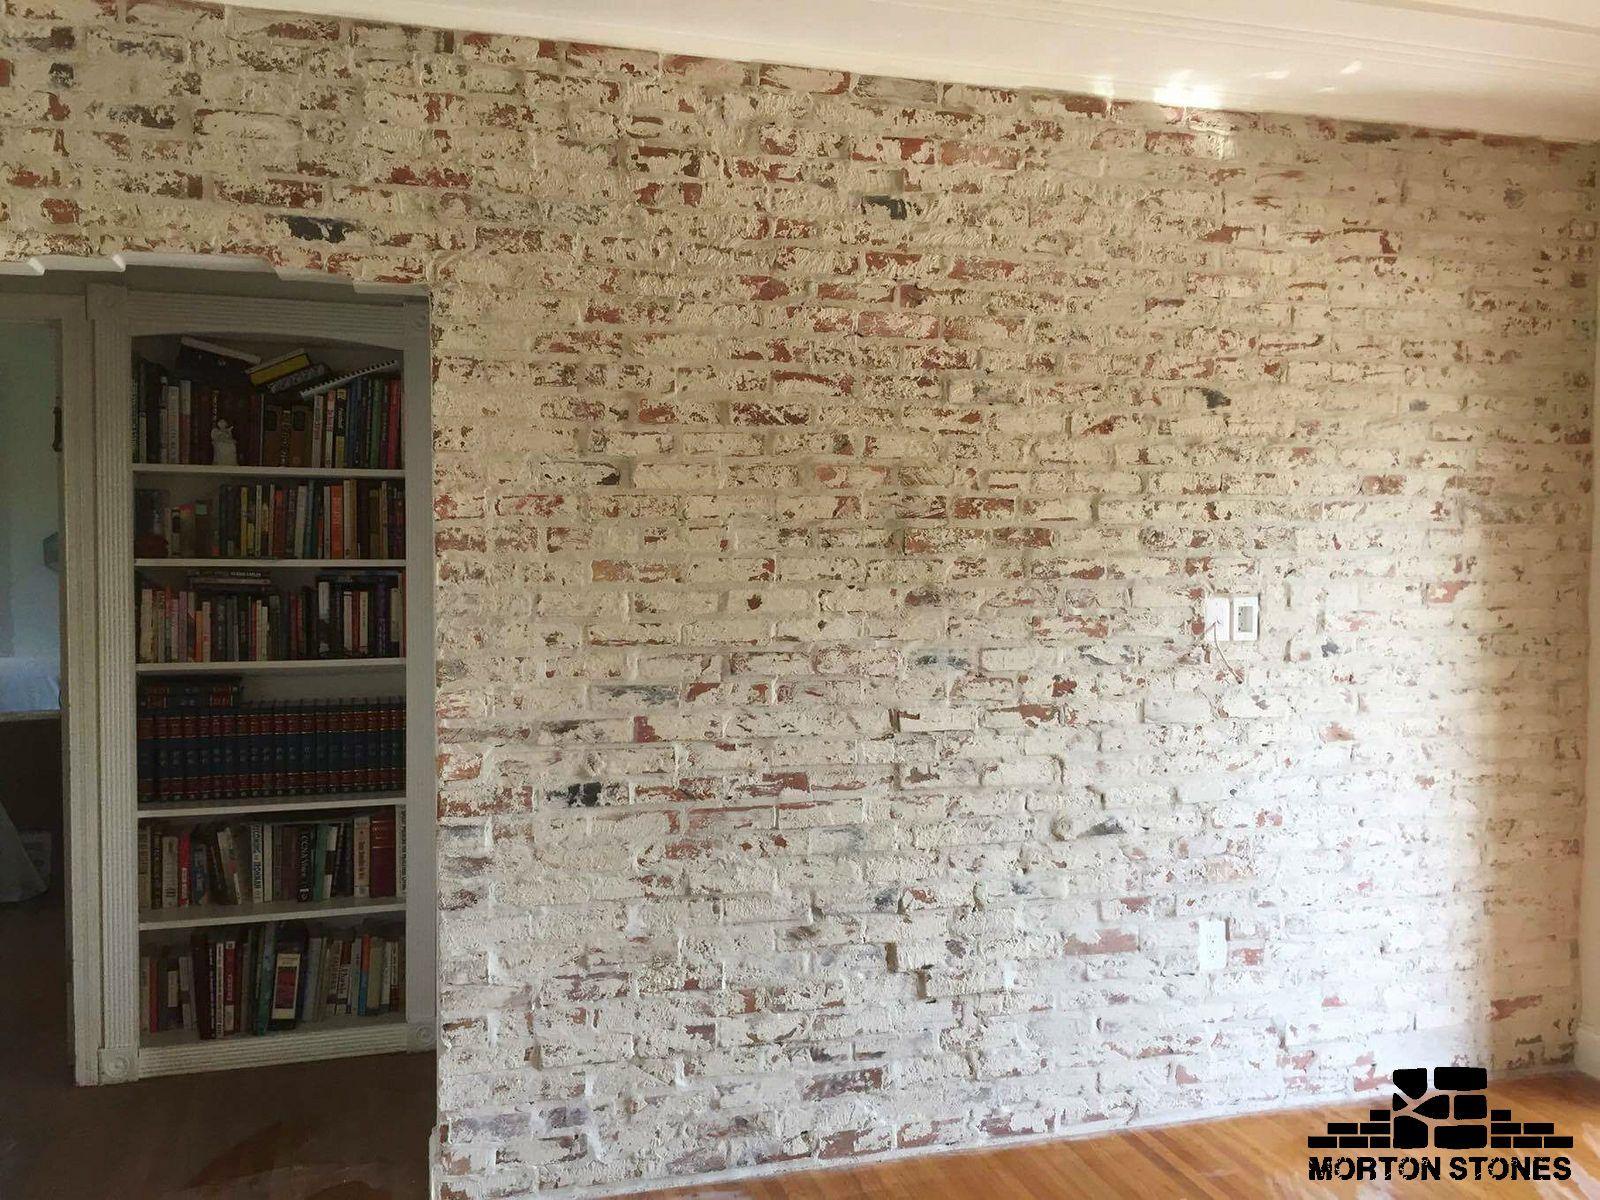 Cozy Living Room Design With A White Brick Wall Mortonstones Brick Tiles Rustic Home Decor Brickve Brick Veneer Wall Thin Brick Veneer White Wash Brick